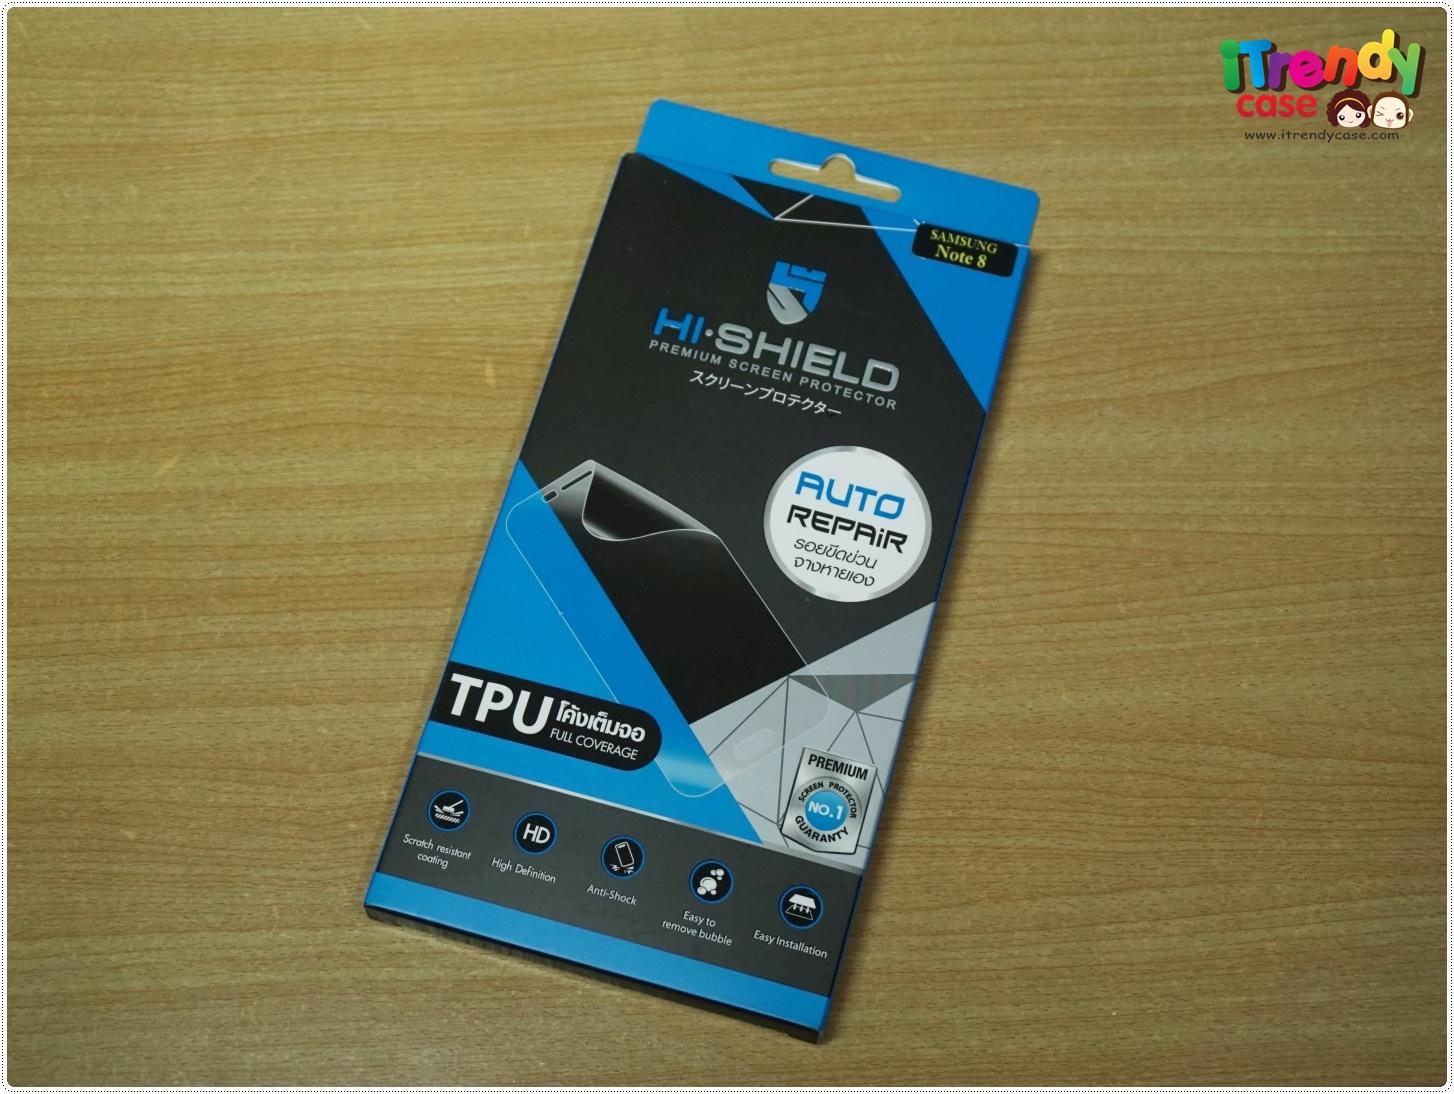 Samsung Note8 (เต็มจอ) - HI-SHIELD ฟิลม์ TPU Auto Repair แท้